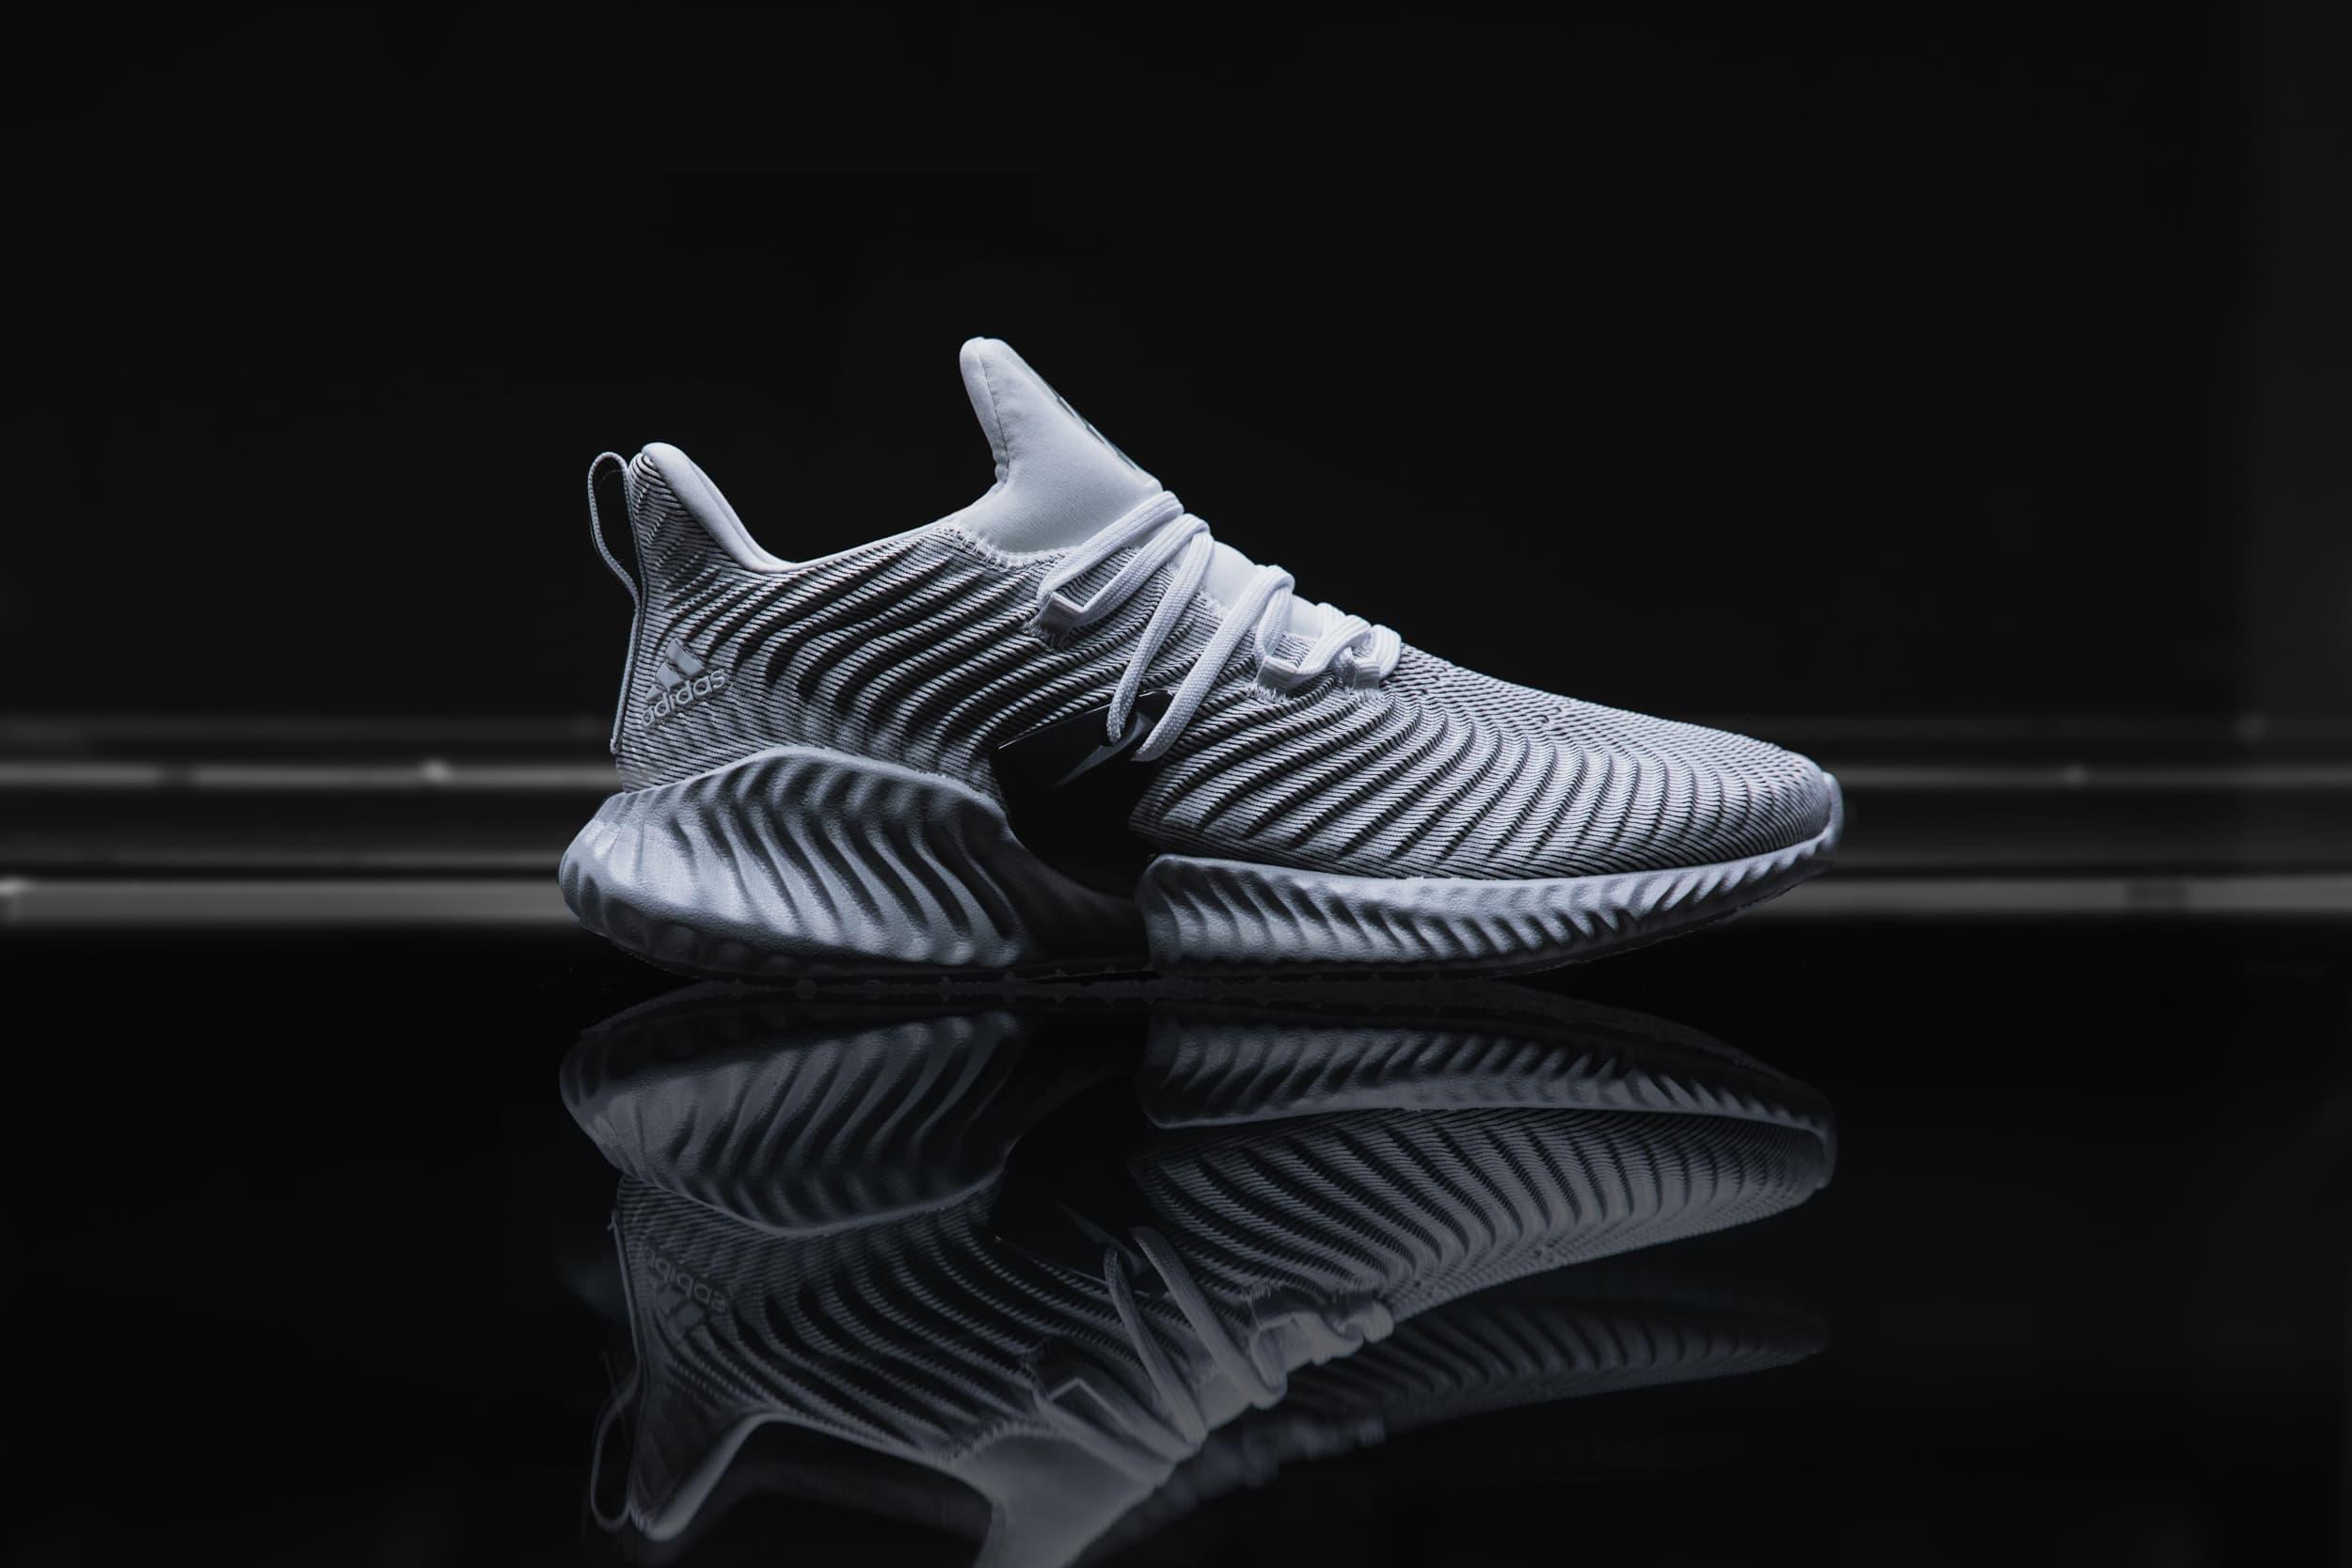 adidas AlphaBOUNCE Instinct